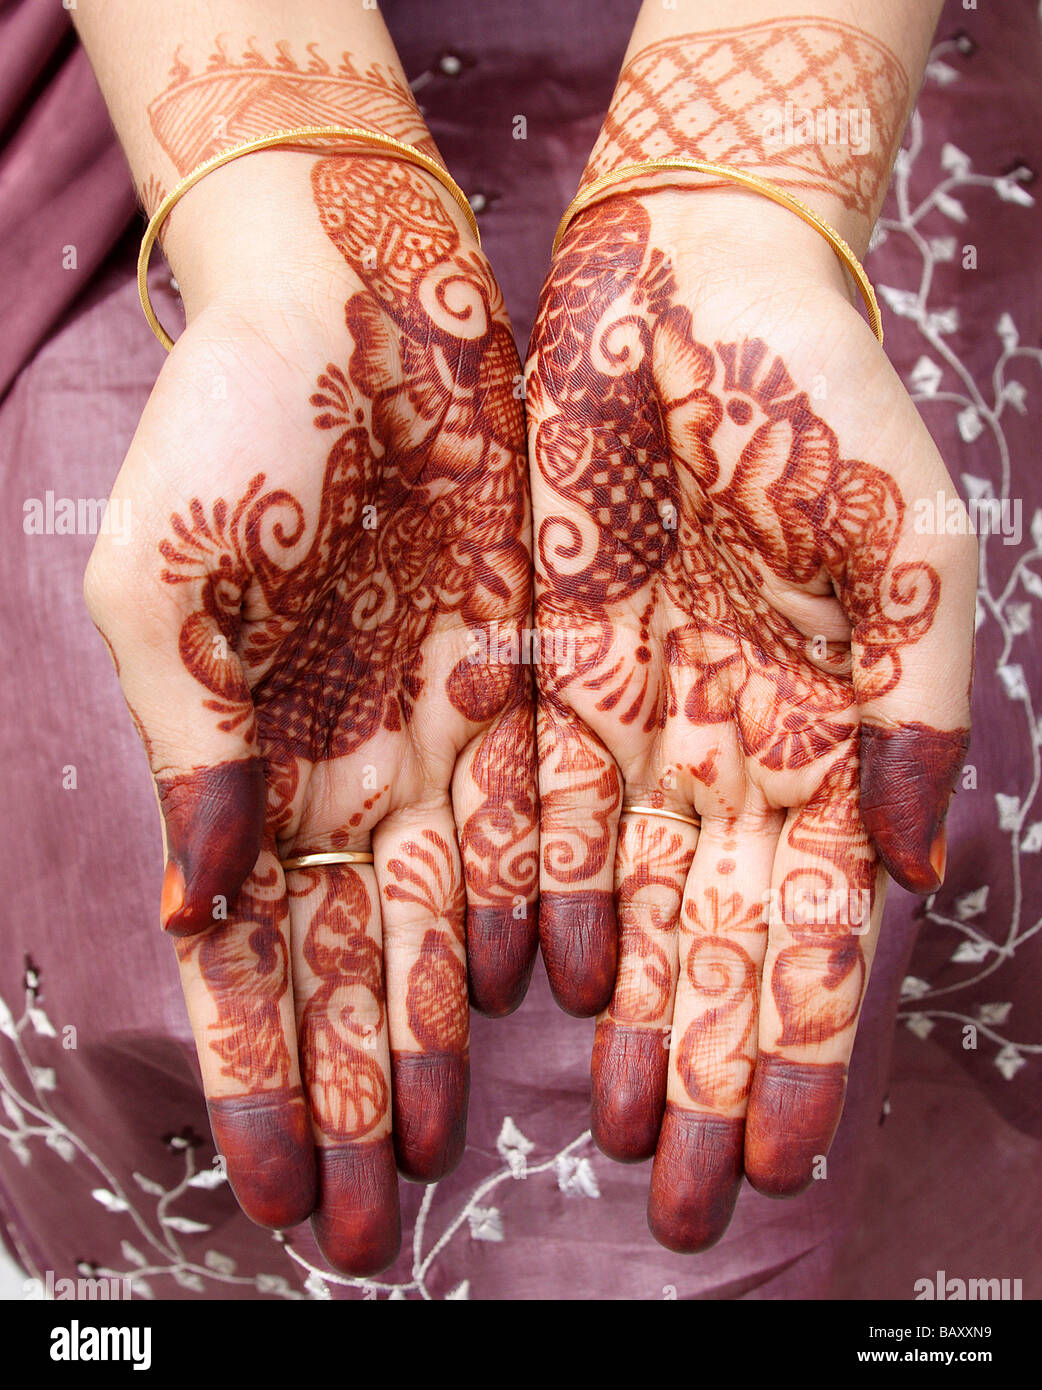 e0ce7818fb74b Beautiful henna tattoo on bride's hands Stock Photo: 23948661 - Alamy